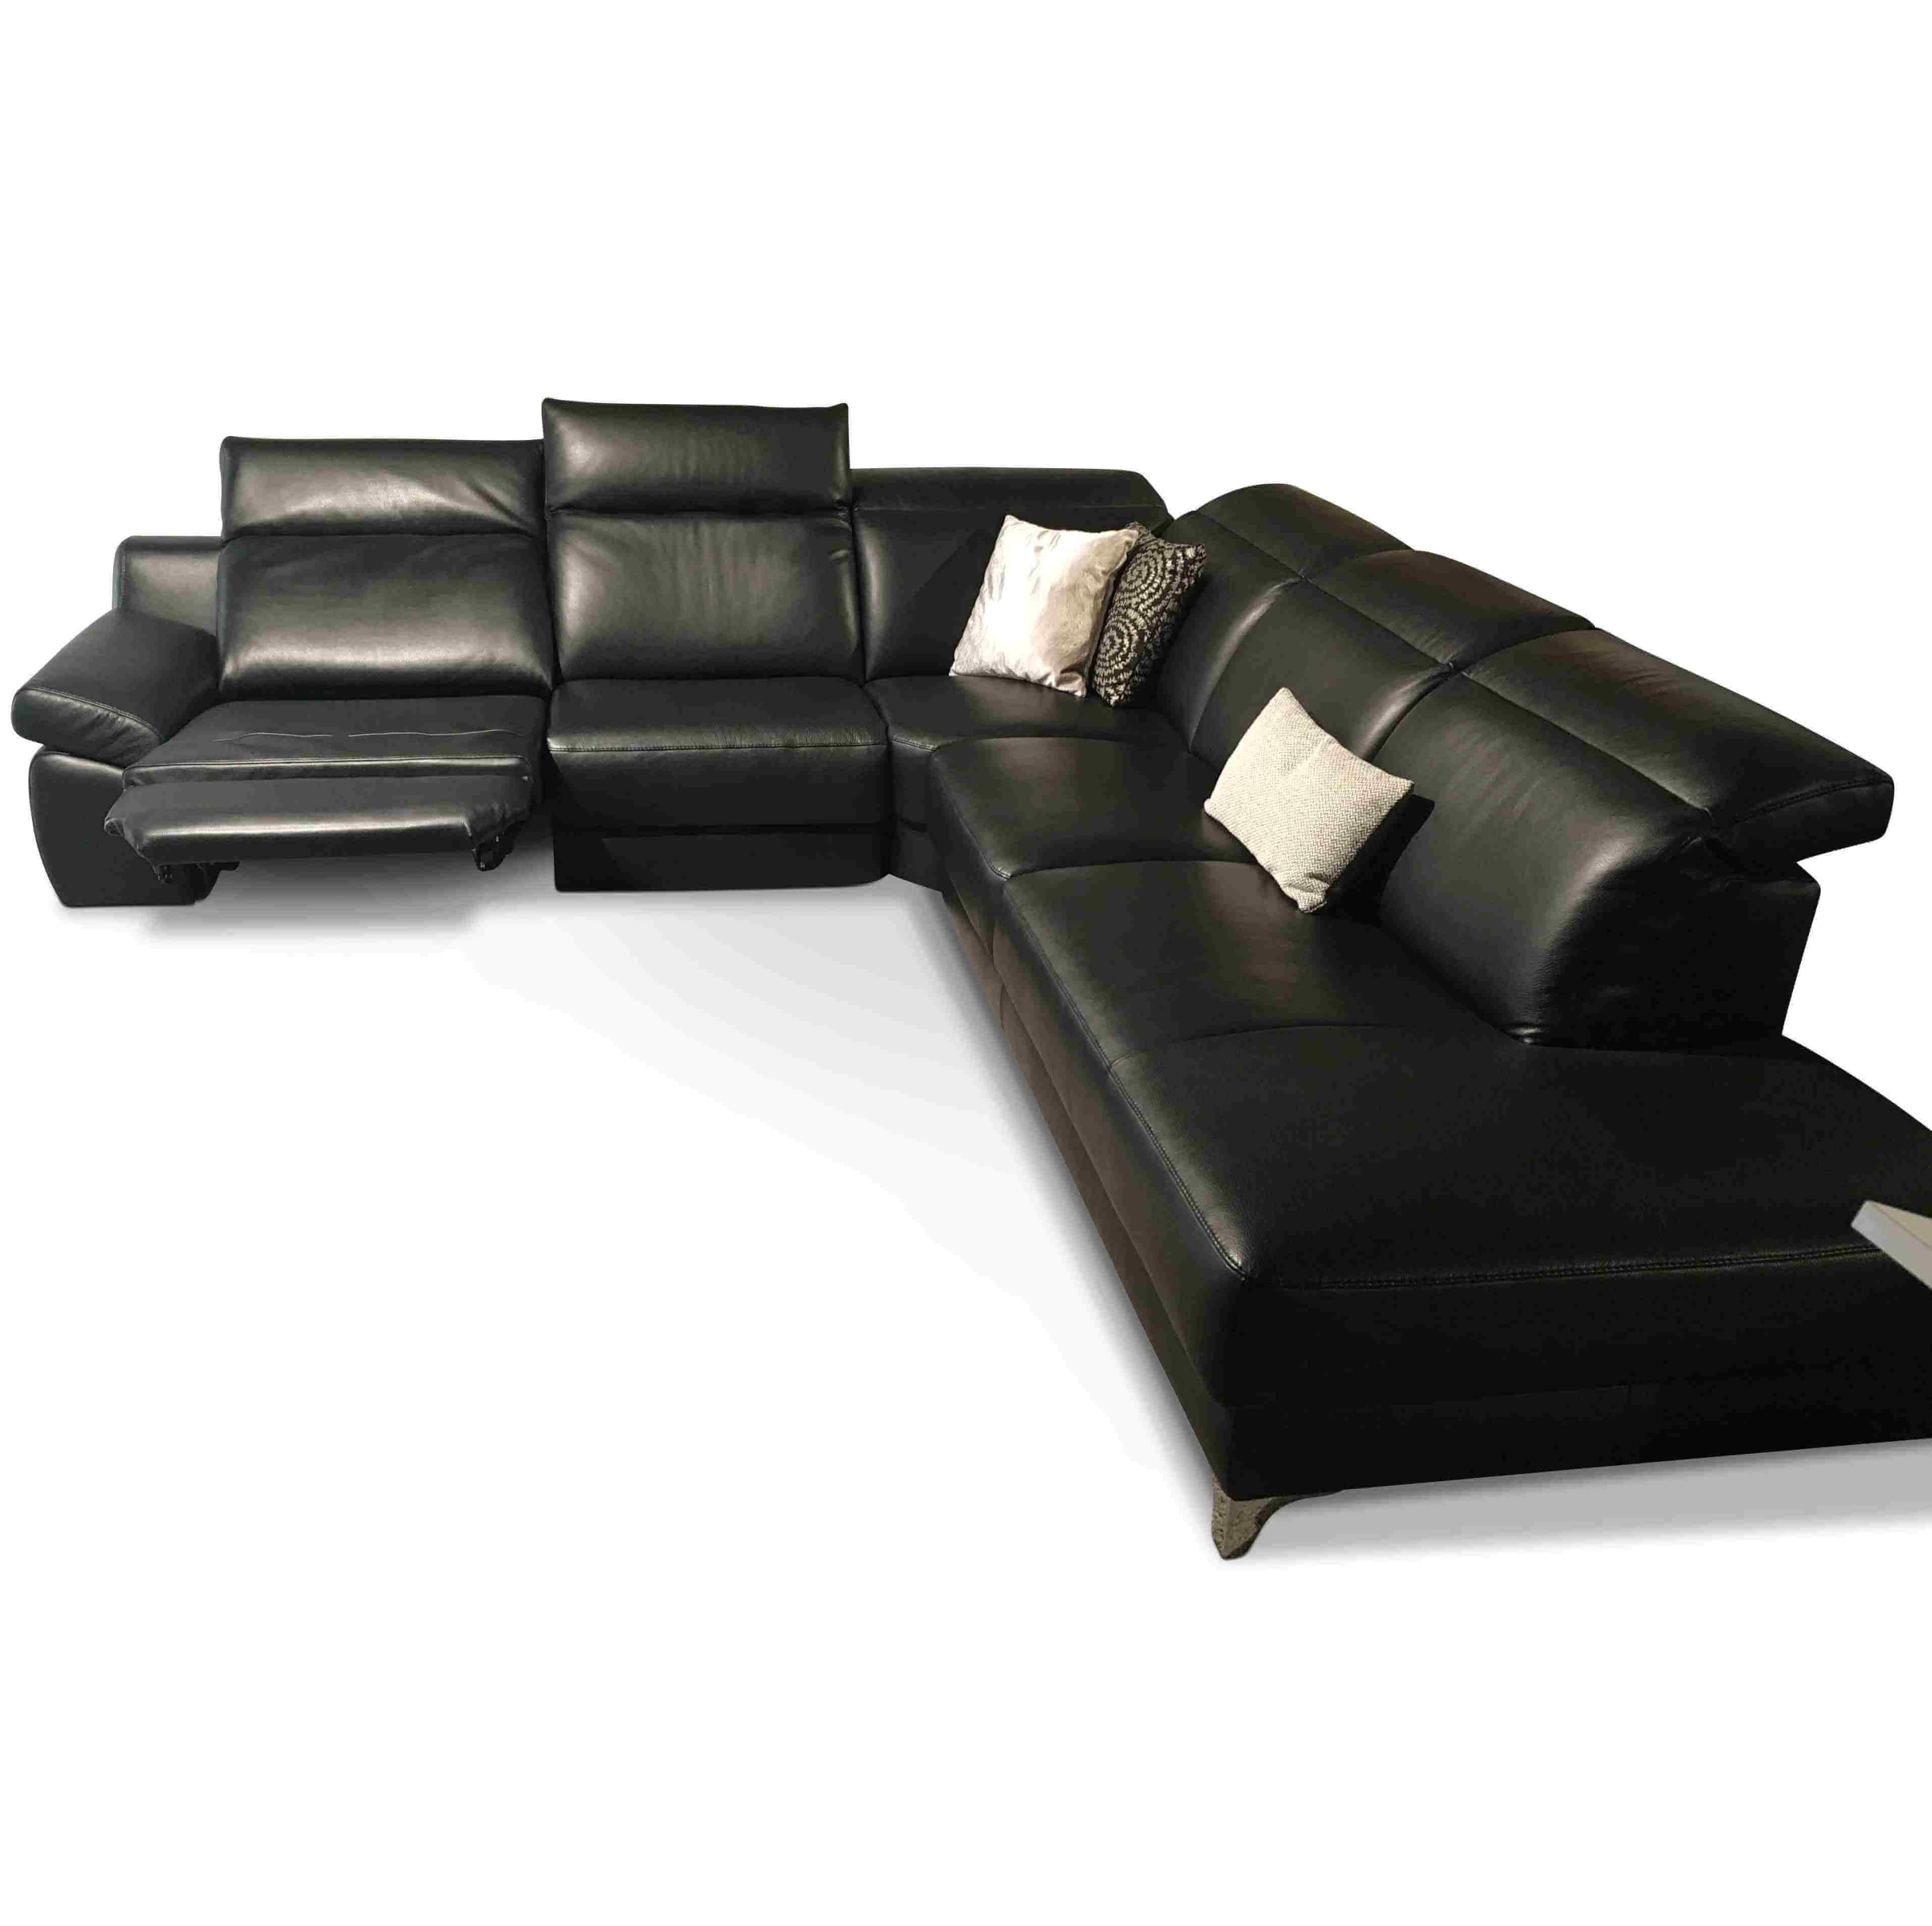 musterring designer ecksofa mr 9110 leder schwarz leder metall schwarz chrom ebay. Black Bedroom Furniture Sets. Home Design Ideas